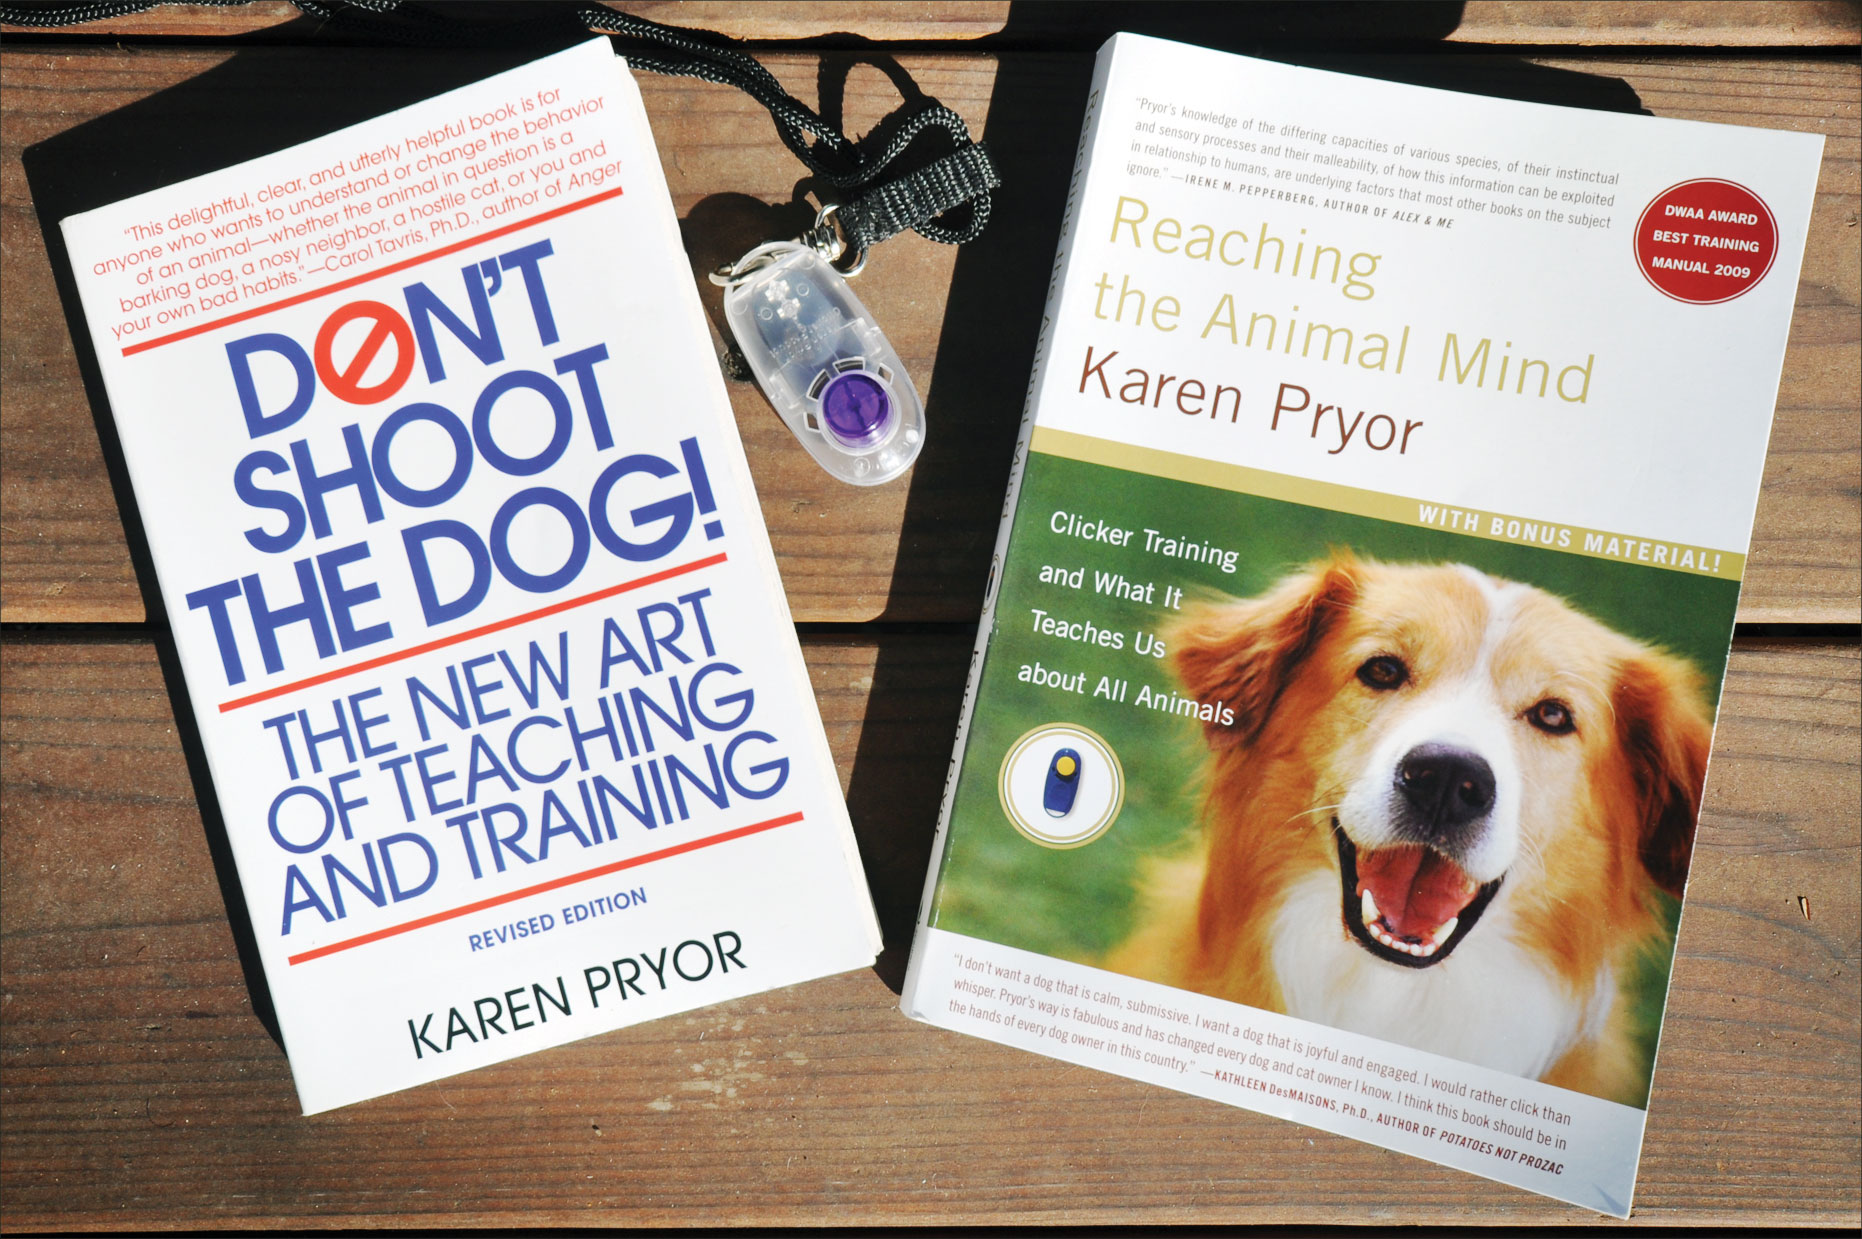 Karen Pryor: Positive Training Icon